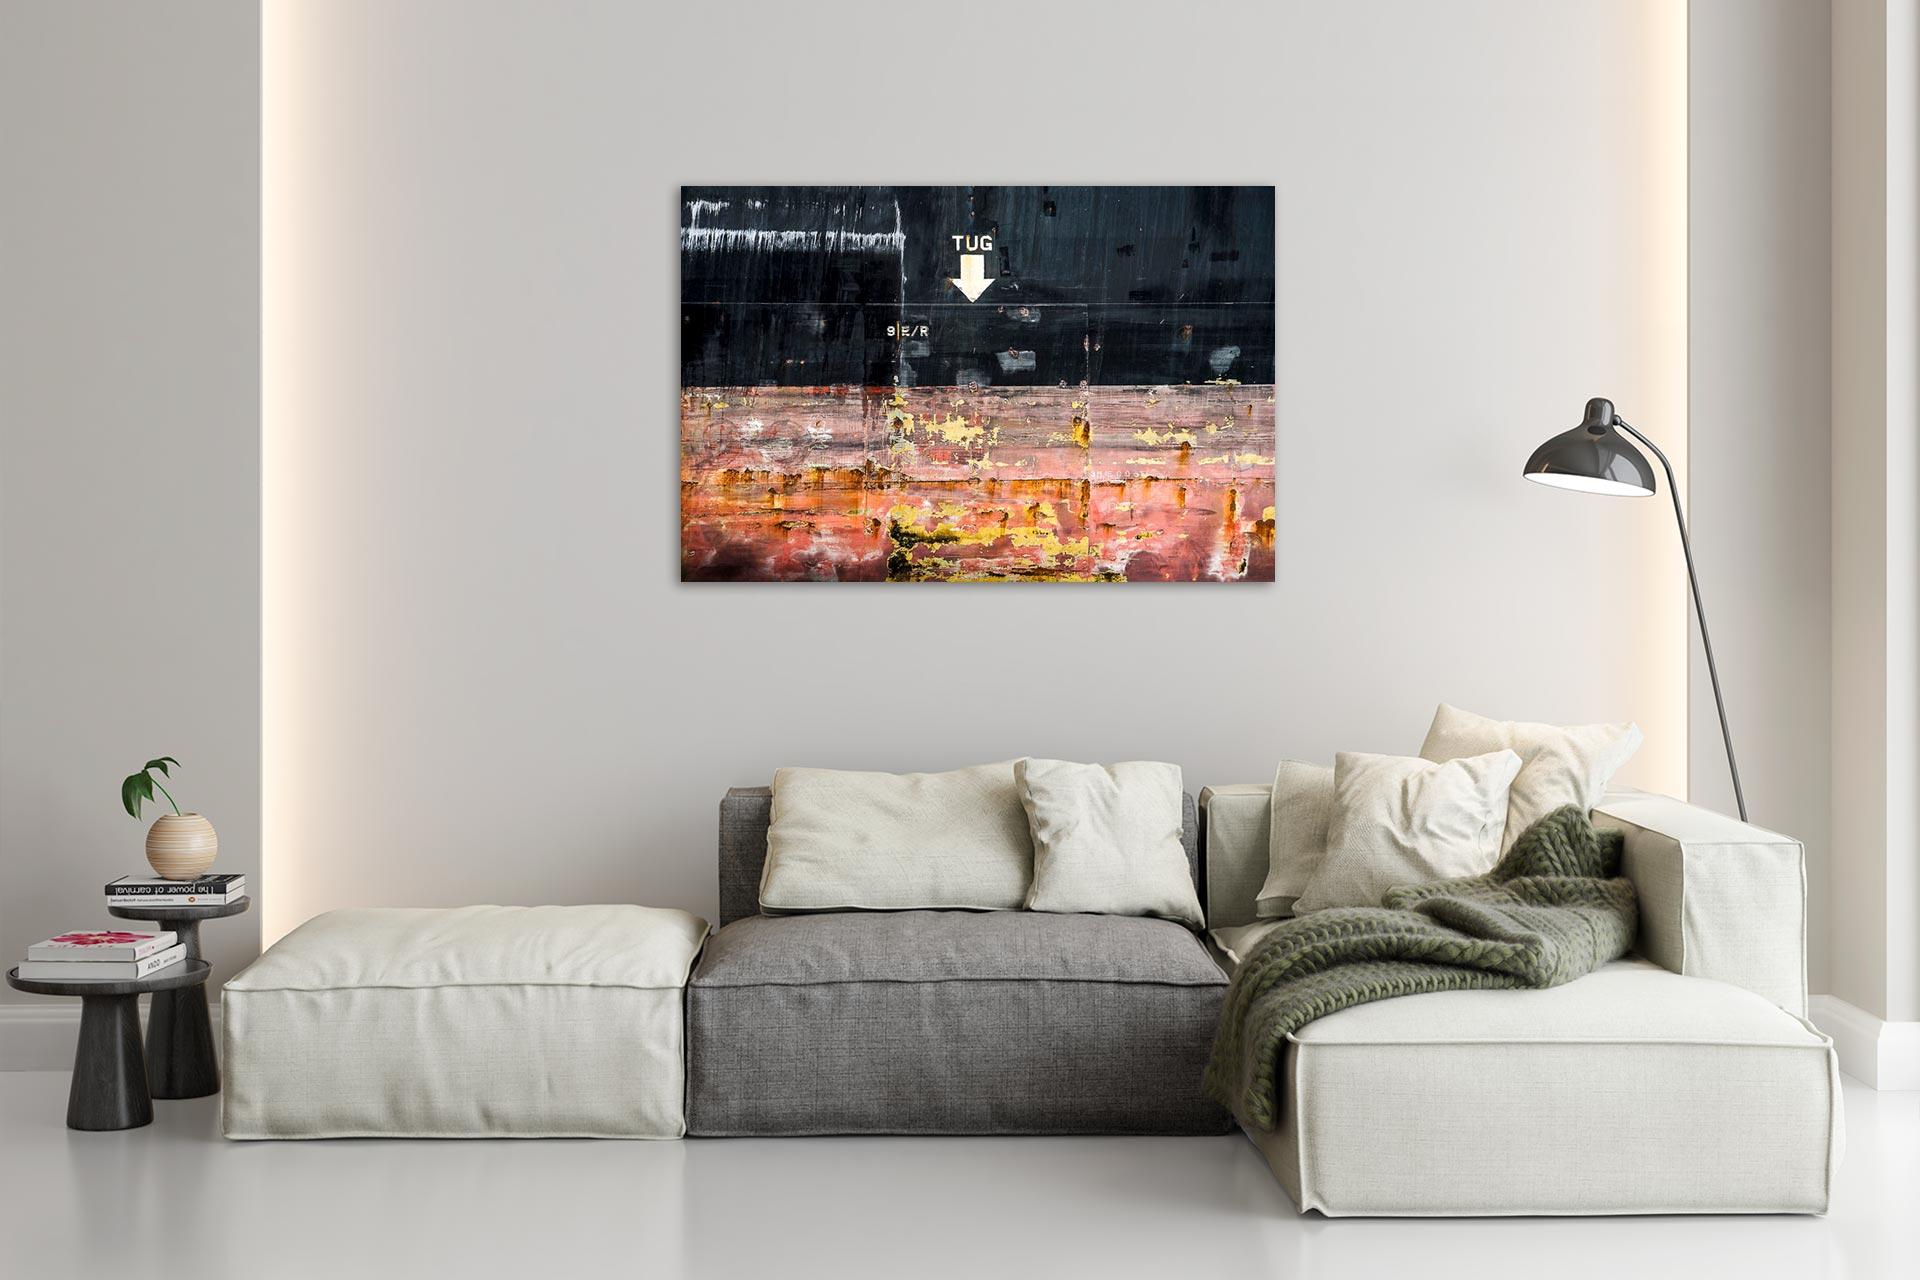 NL048-schiffswand-hamburg-wandbild-auf-leinwand-acrylglas-aludibond-wohnzimmer